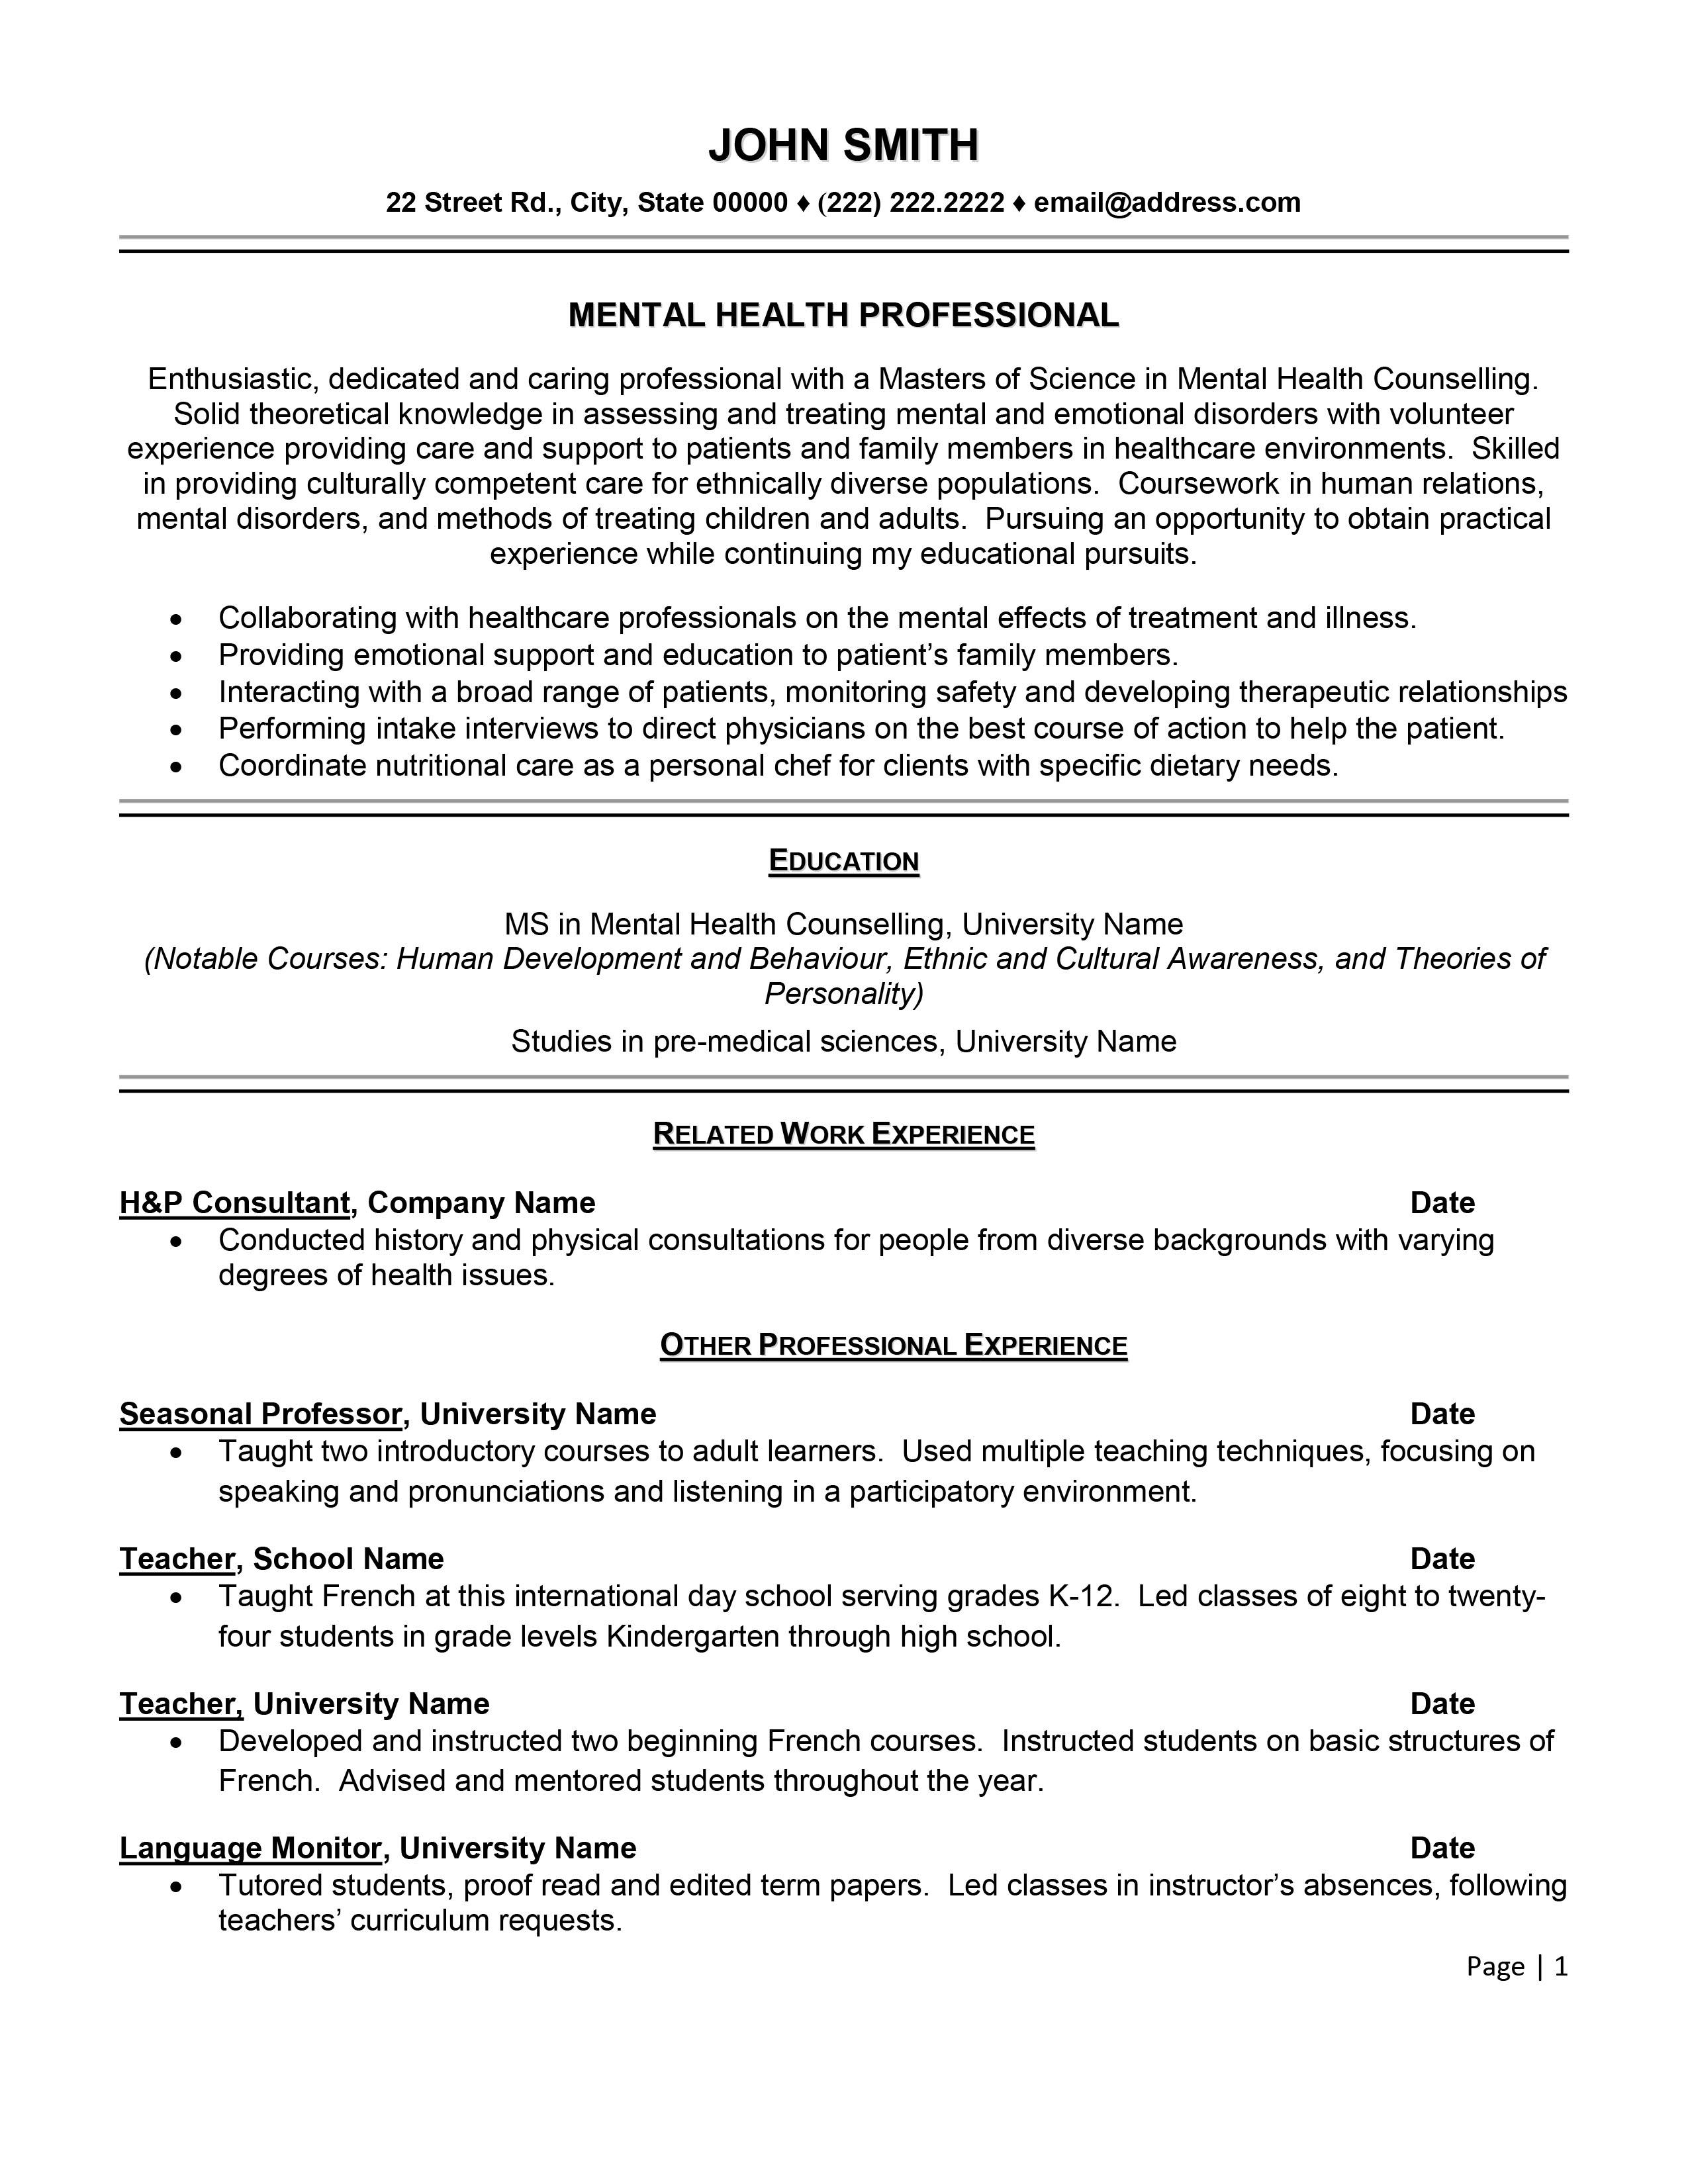 Mental Health Professional Resume Template Premium Resume